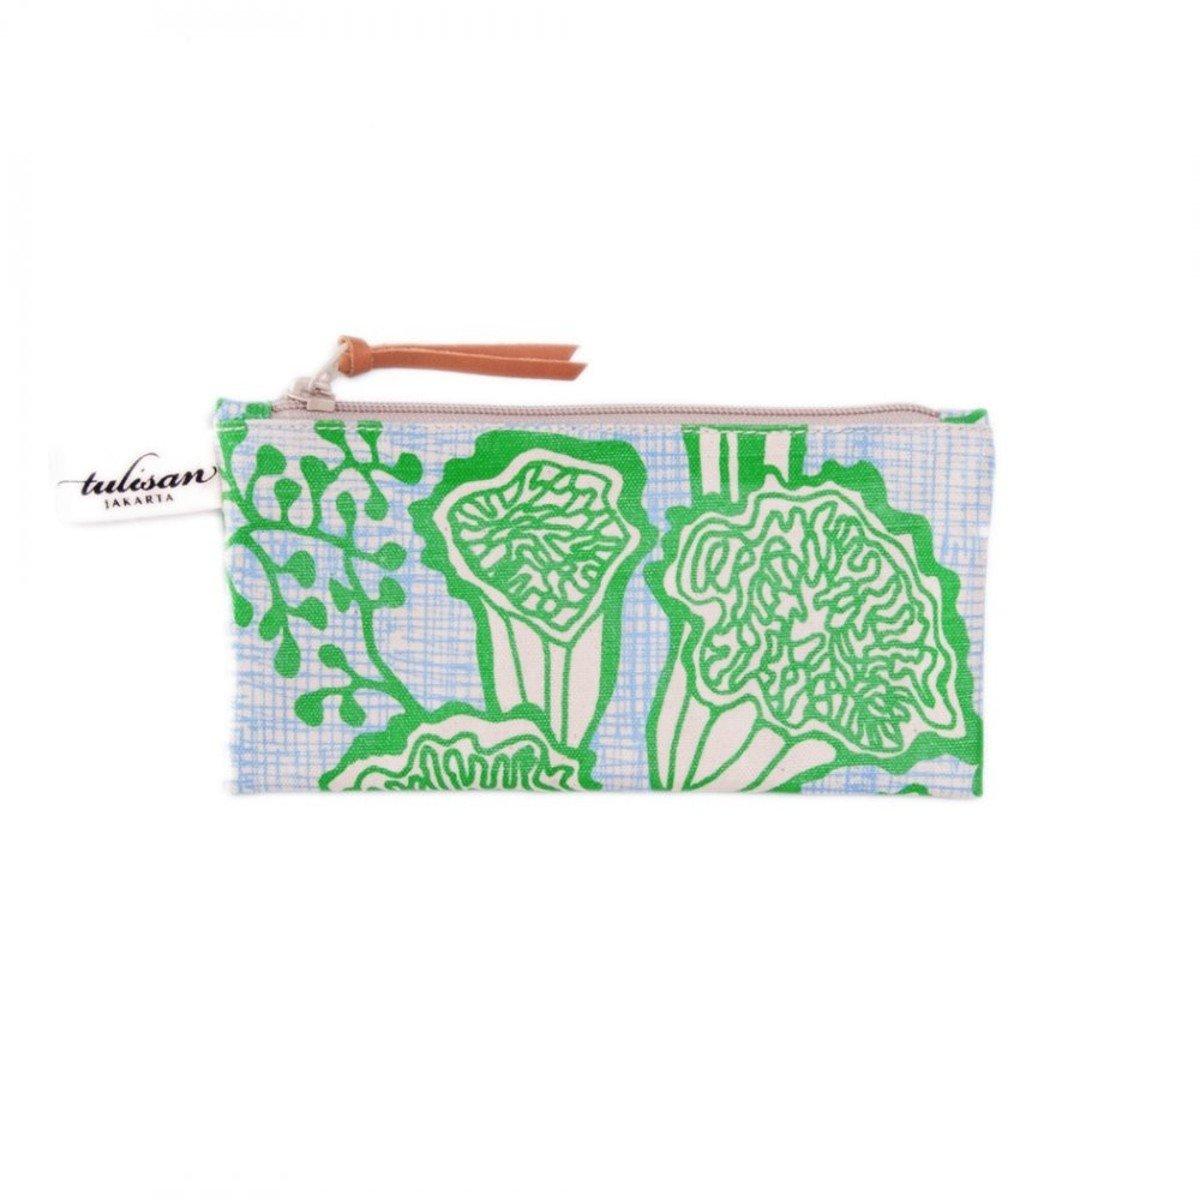 小筆袋 - Green Grass